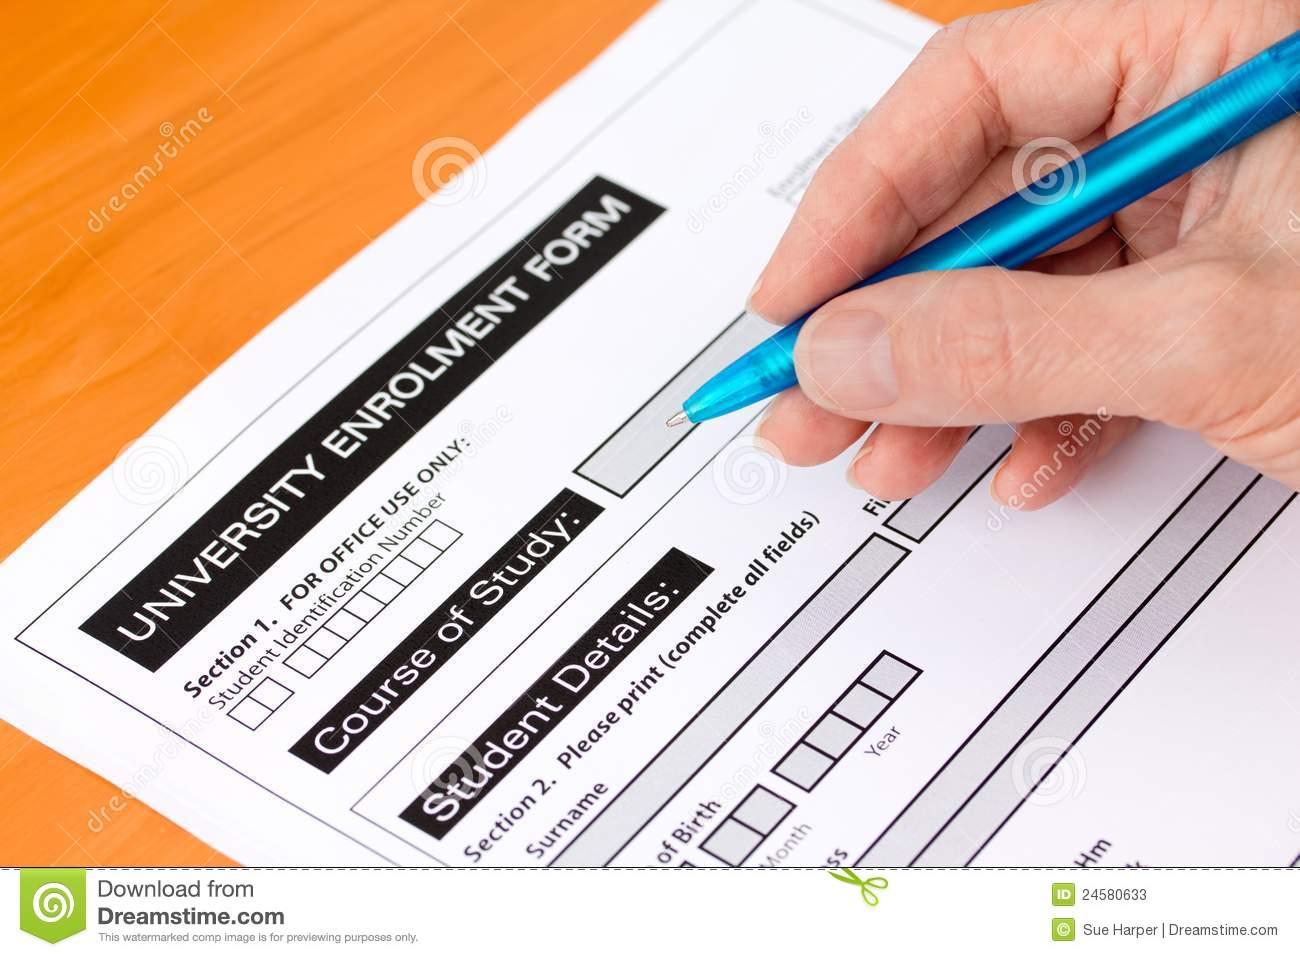 hand-completing-university-application-form-24580633 Victory University Application Form on grambling state, malawi mzuzu, great zimbabwe,